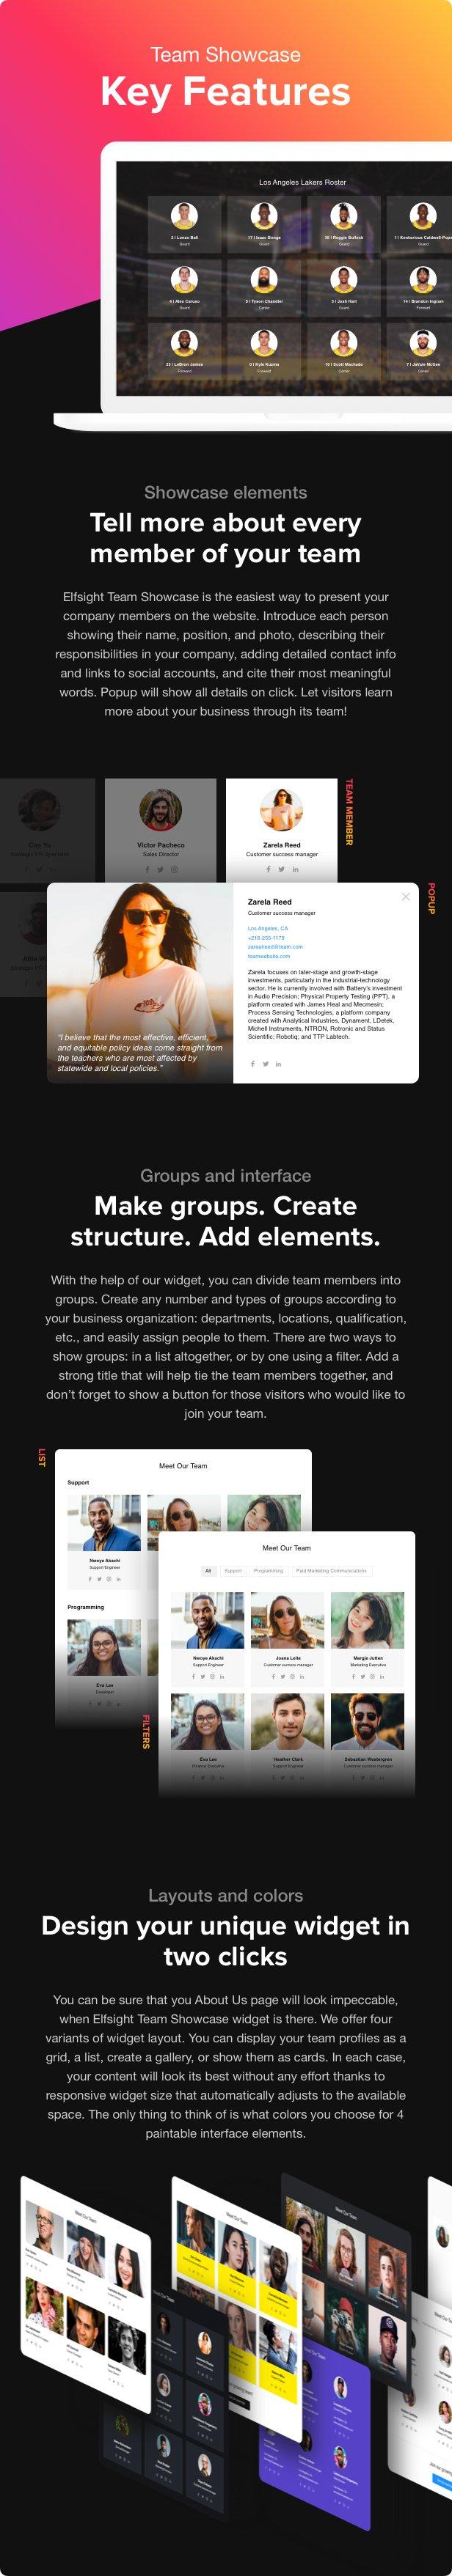 Team Showcase - WordPress Team Showcase plugin - 2